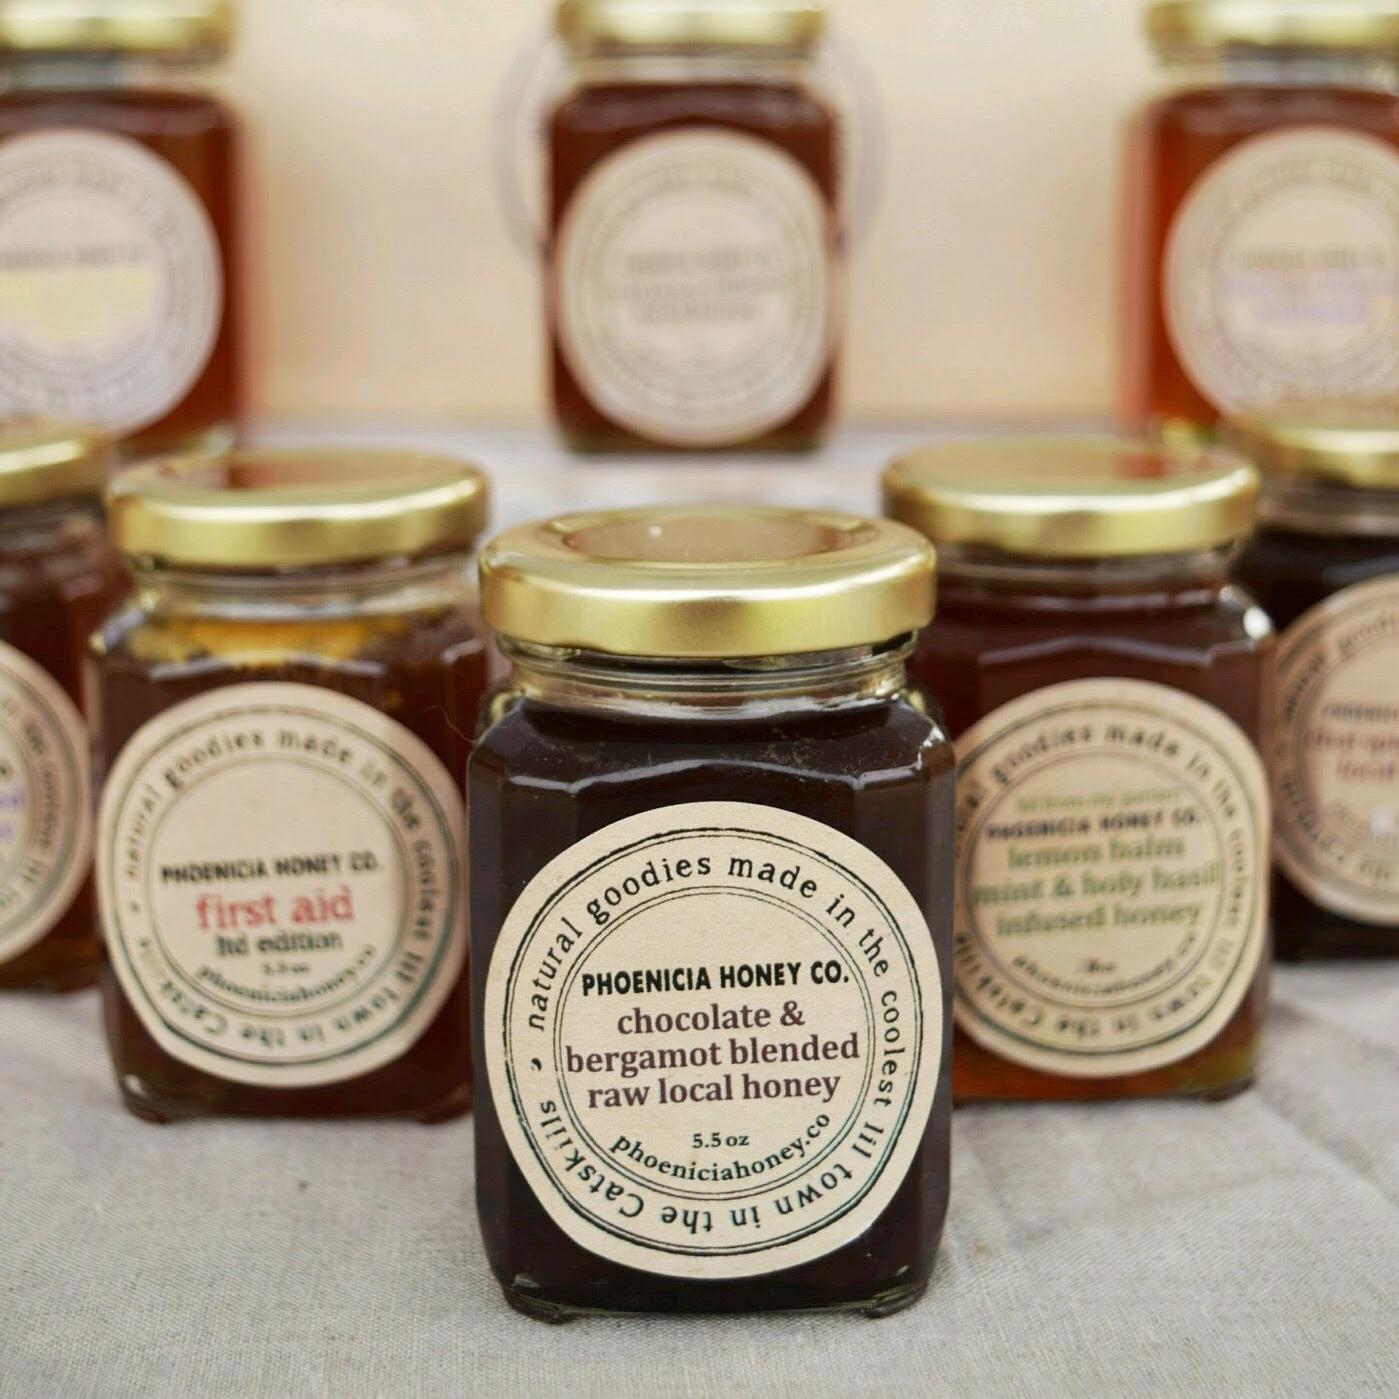 Phoenicia Honey Co., Honey Skincare & Candles